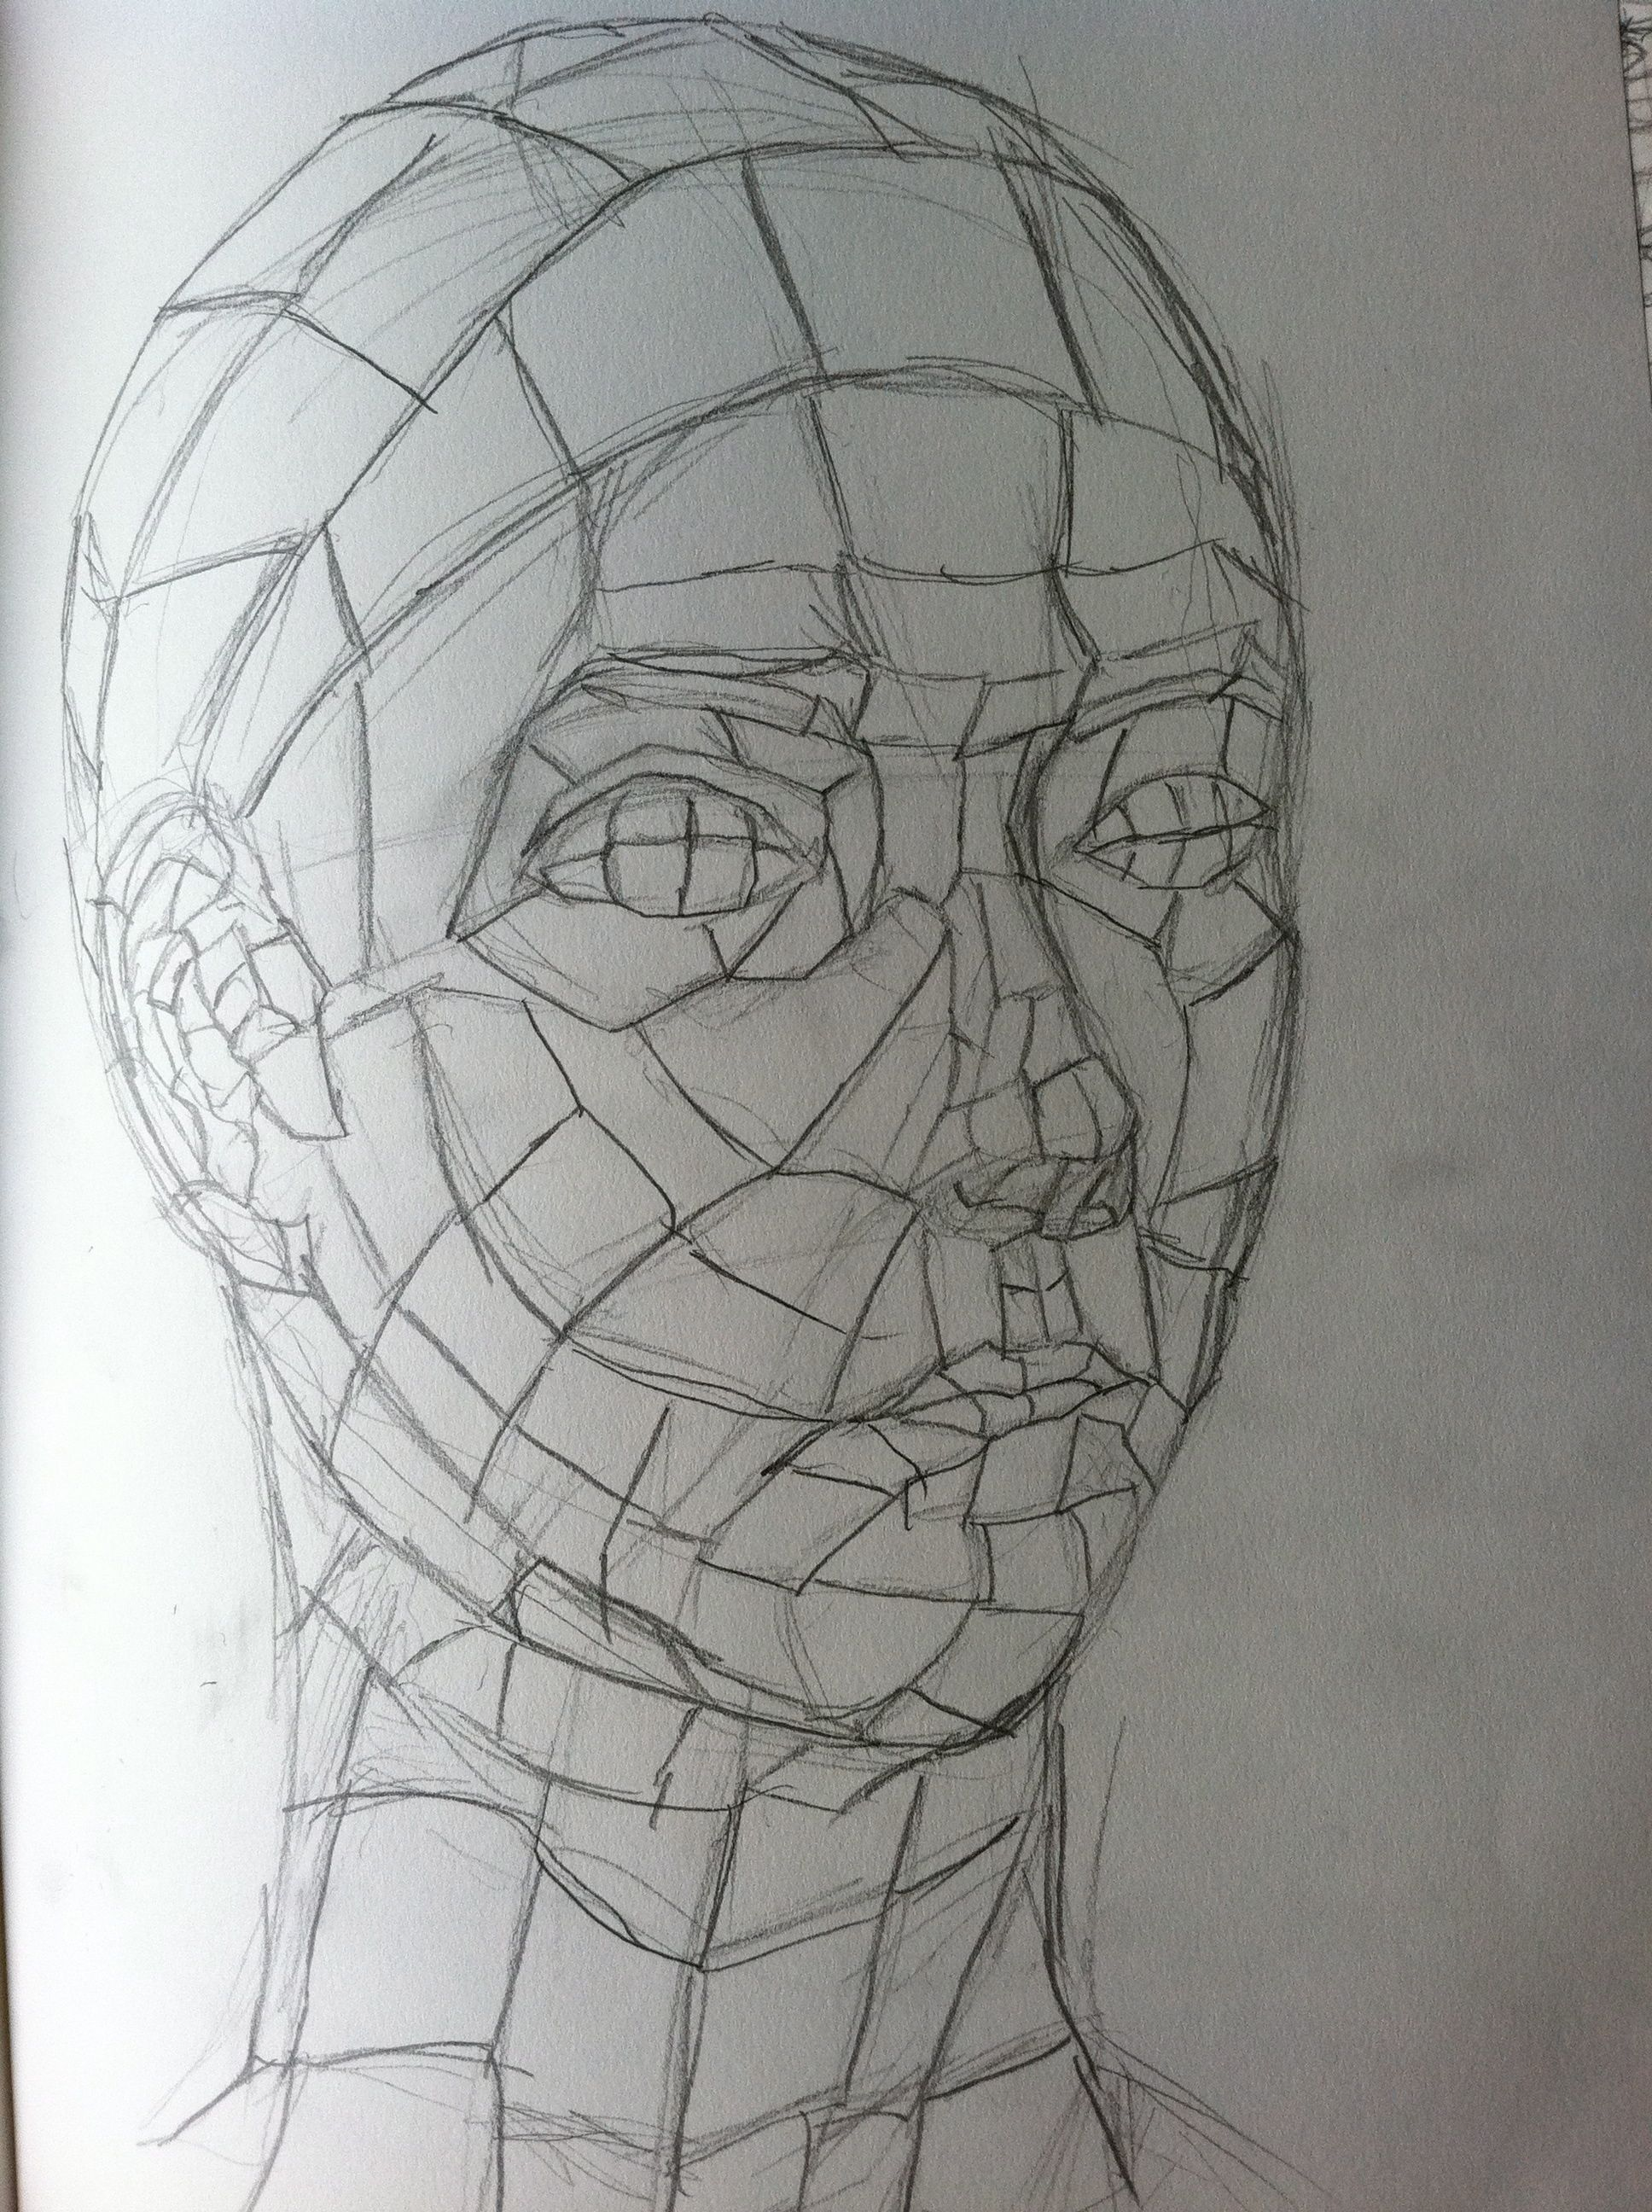 Cross Contour Line Drawing Face : Cross contour lines contours low poly and portraits